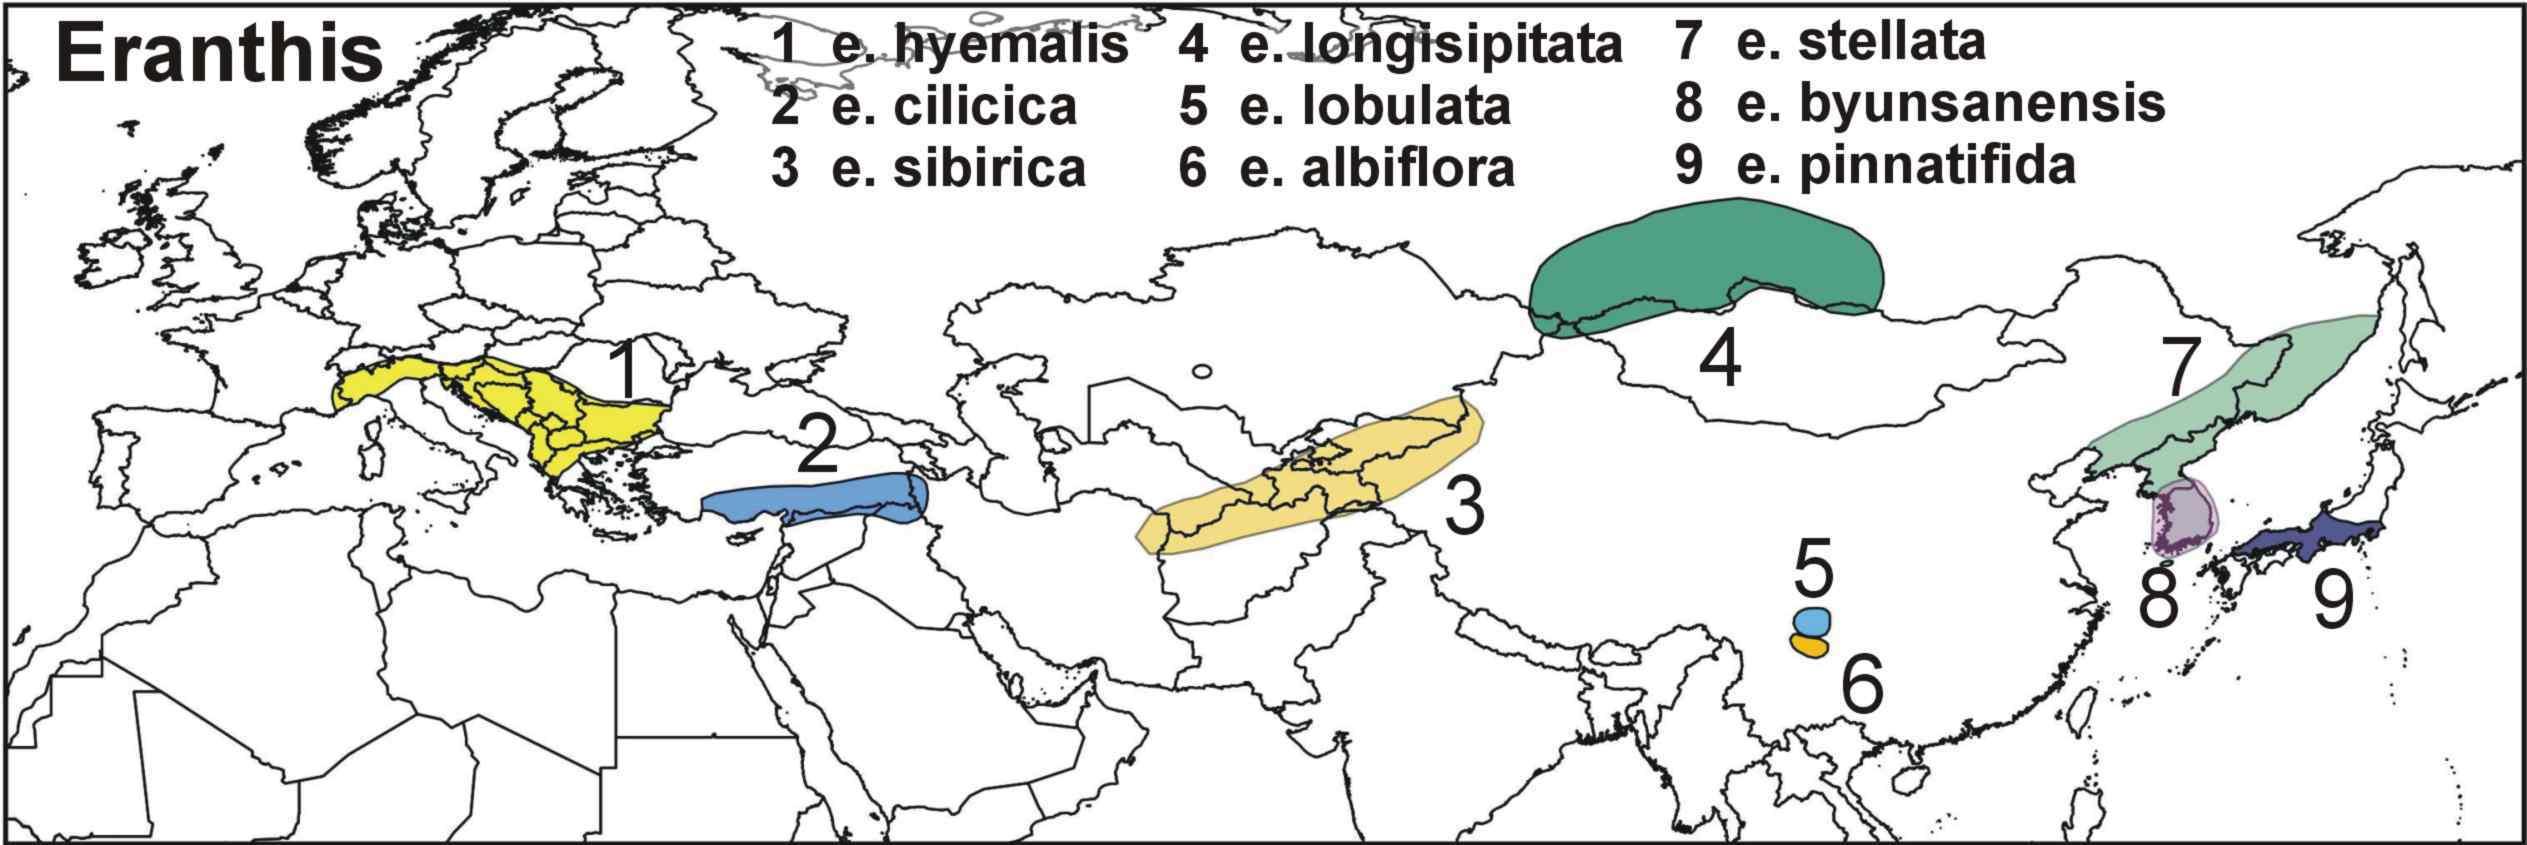 "<span class=""translation_missing"" title=""translation missing: en.medium.untitled.map_image_of, page_name: eranthis"">Map Image Of</span>"